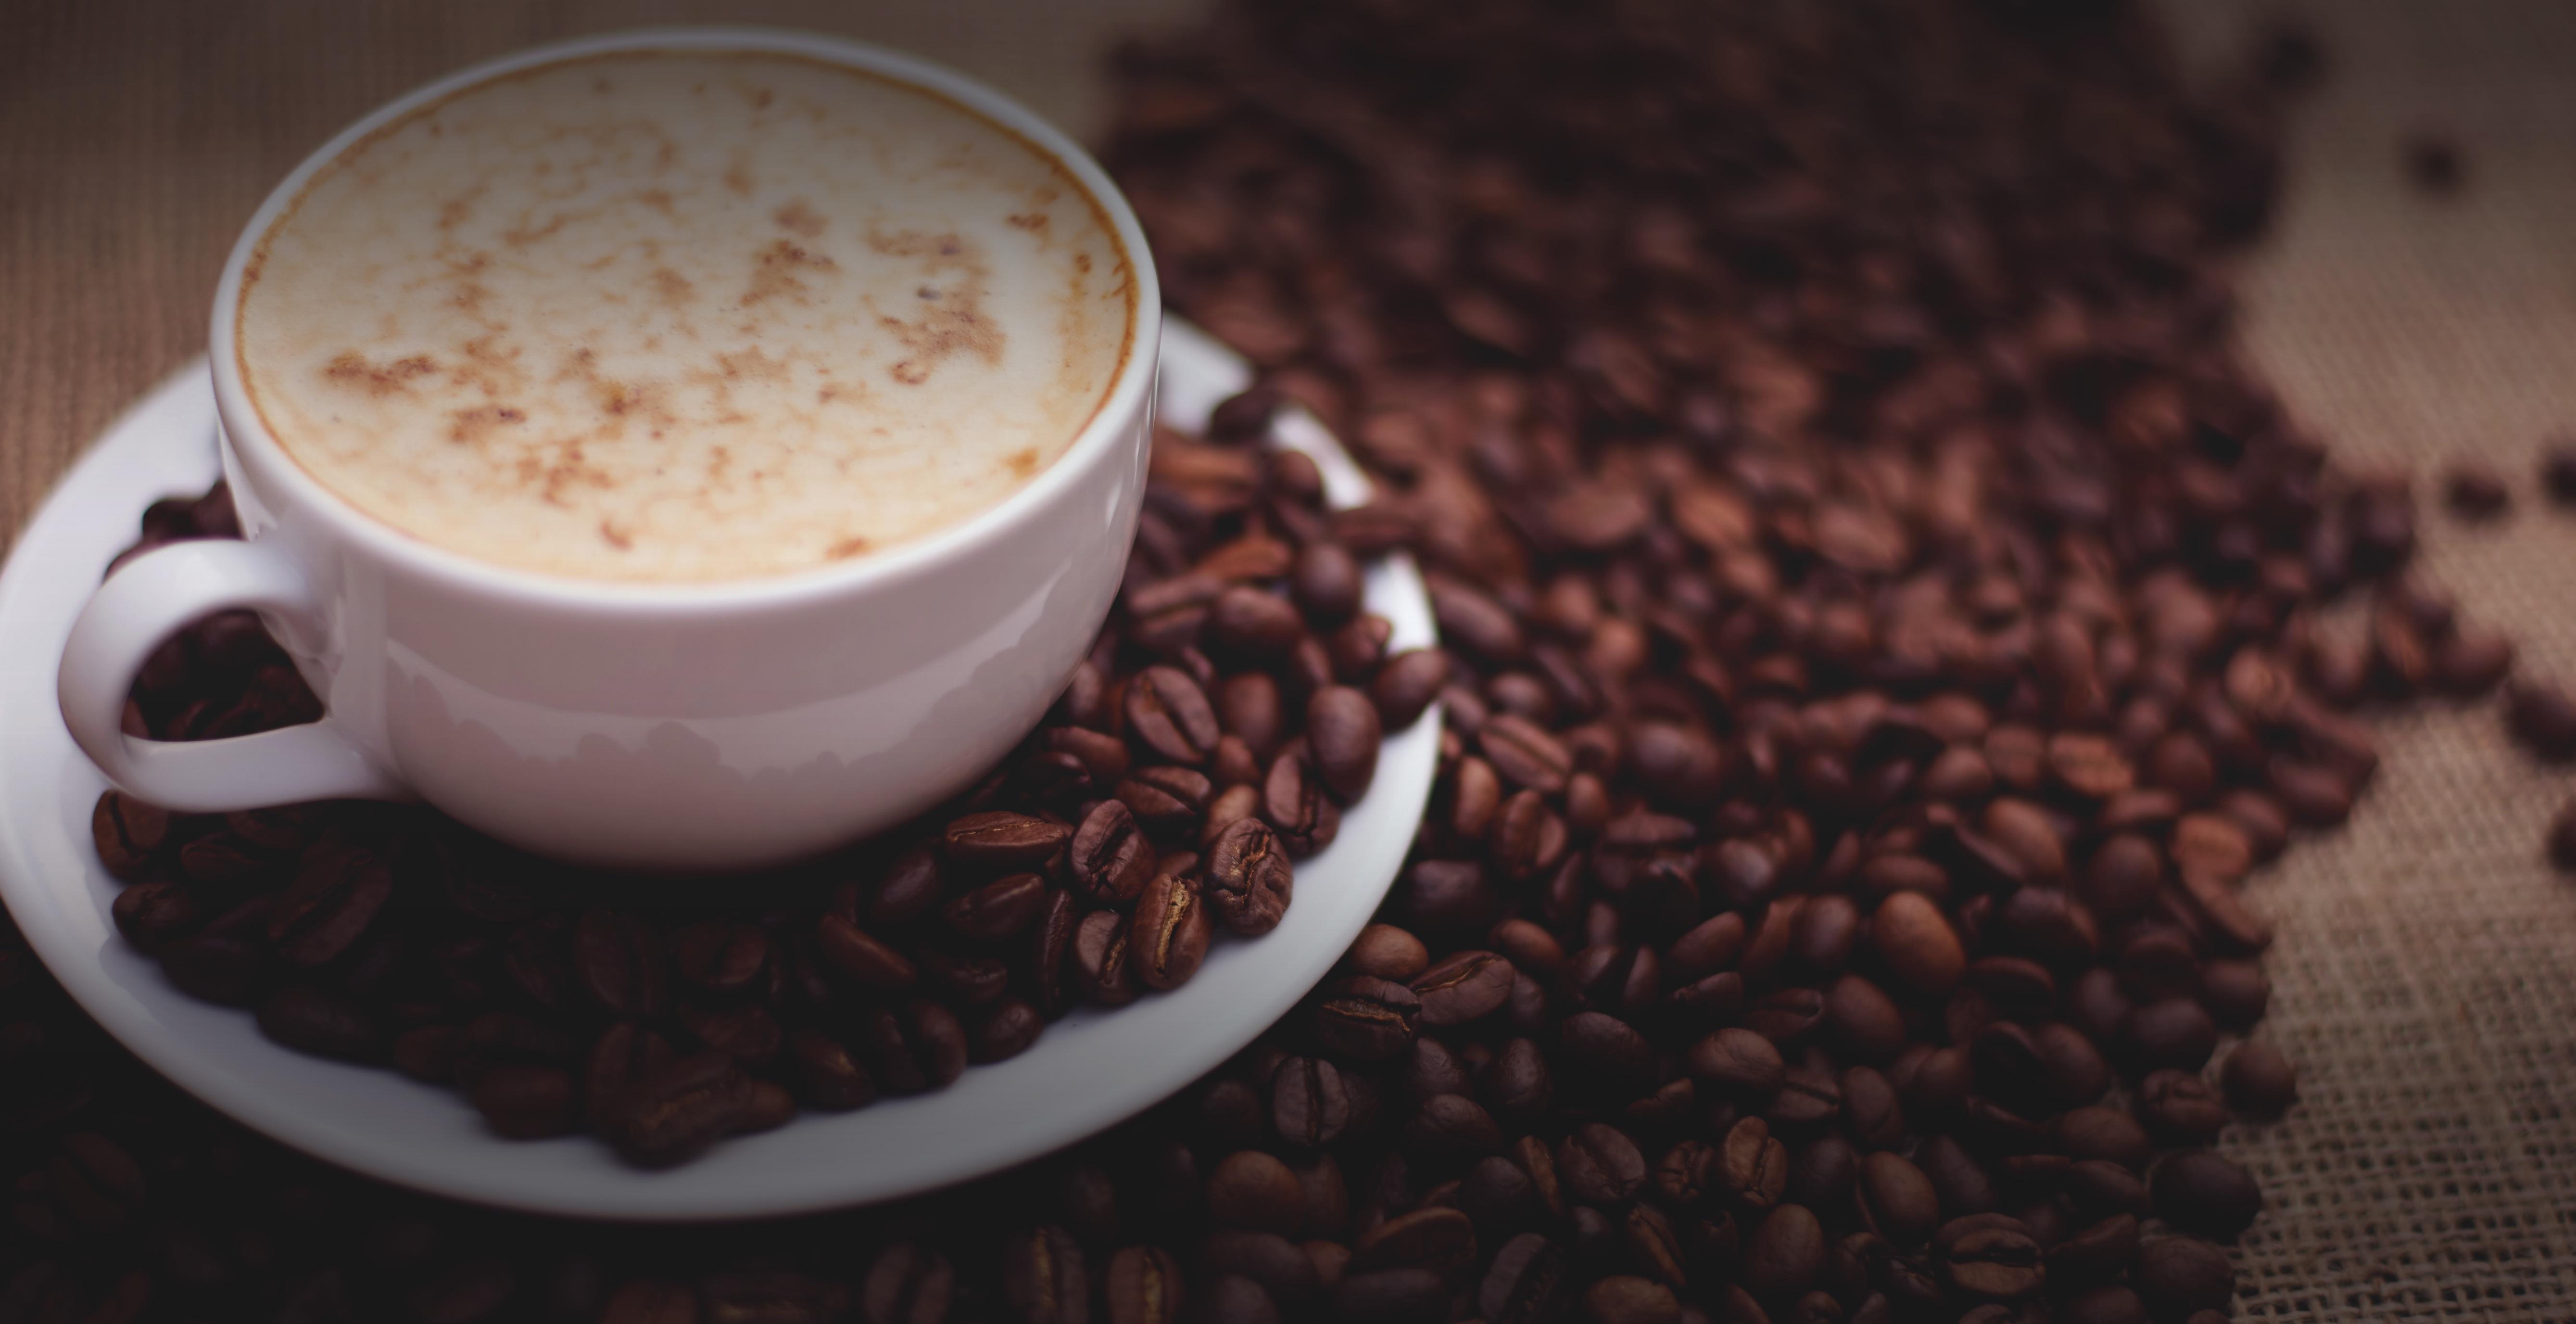 Kostenlose foto latt cappuccino braun getr nk espresso becher kaffeetasse tasse kaffee - Bilder cappuccino ...